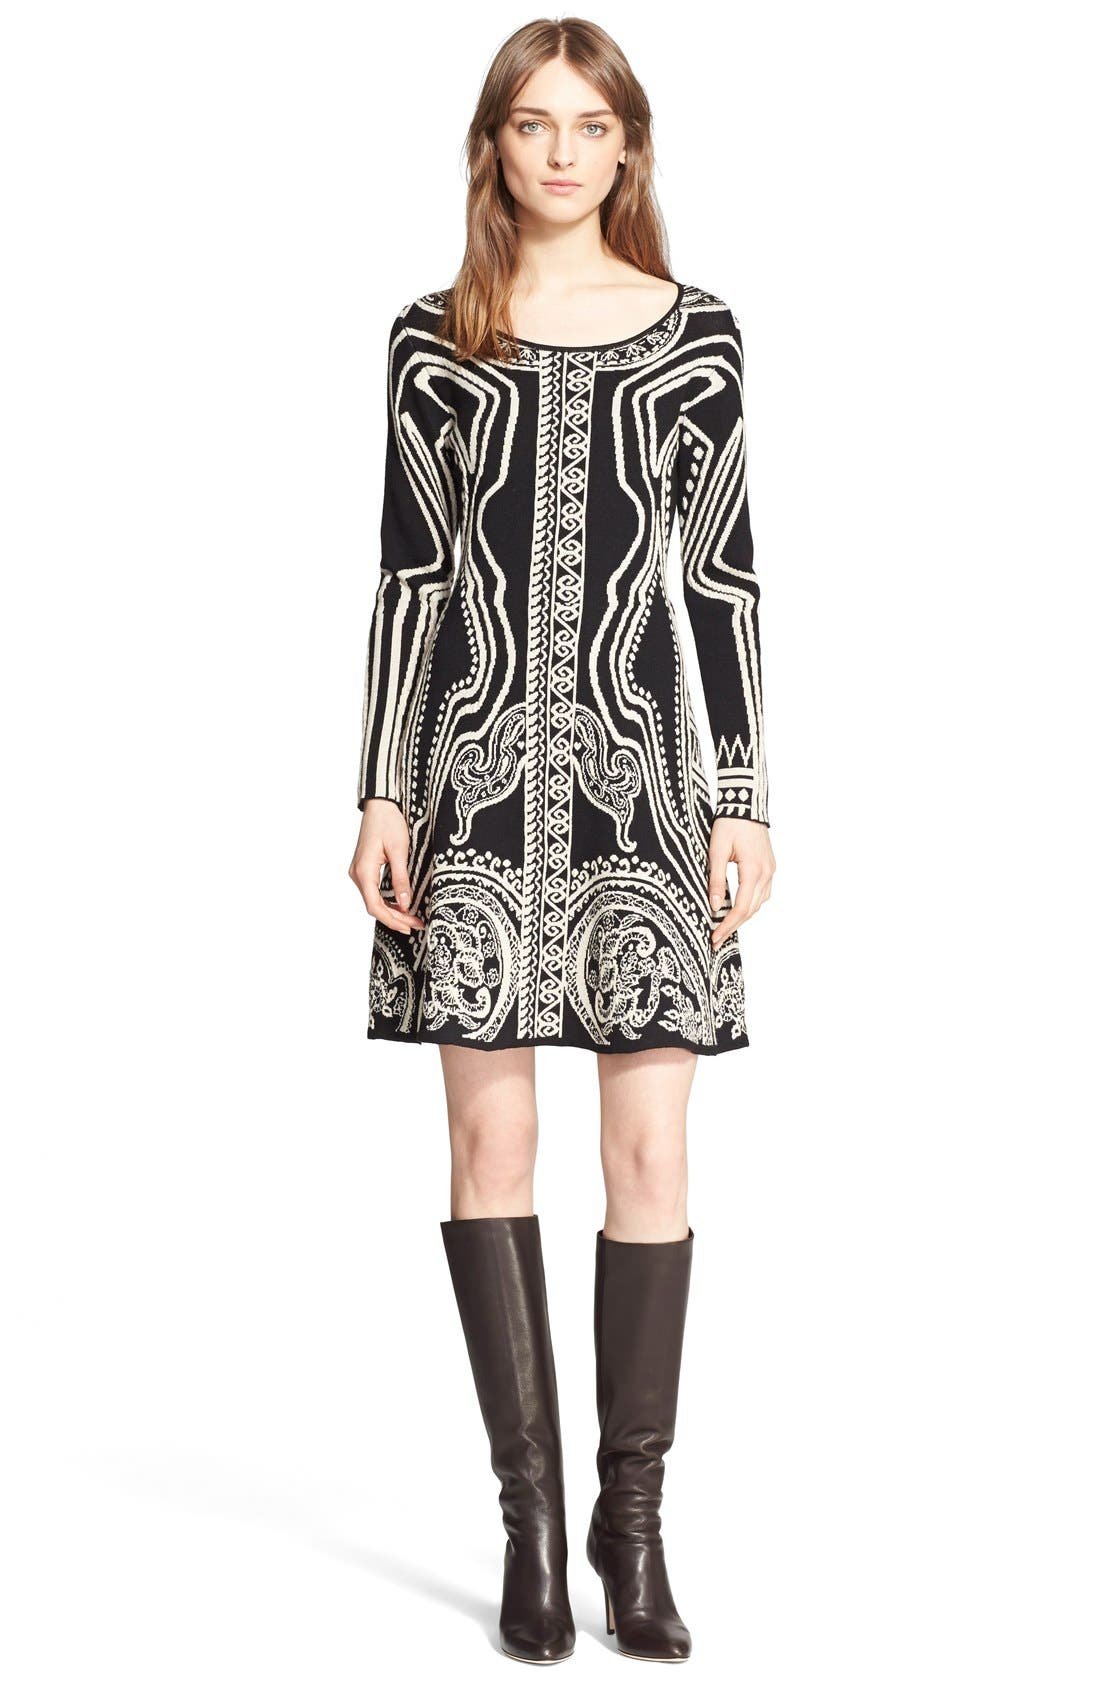 Alternate Image 1 Selected - Etro Paisley Intarsia Knit Long Sleeve Dress